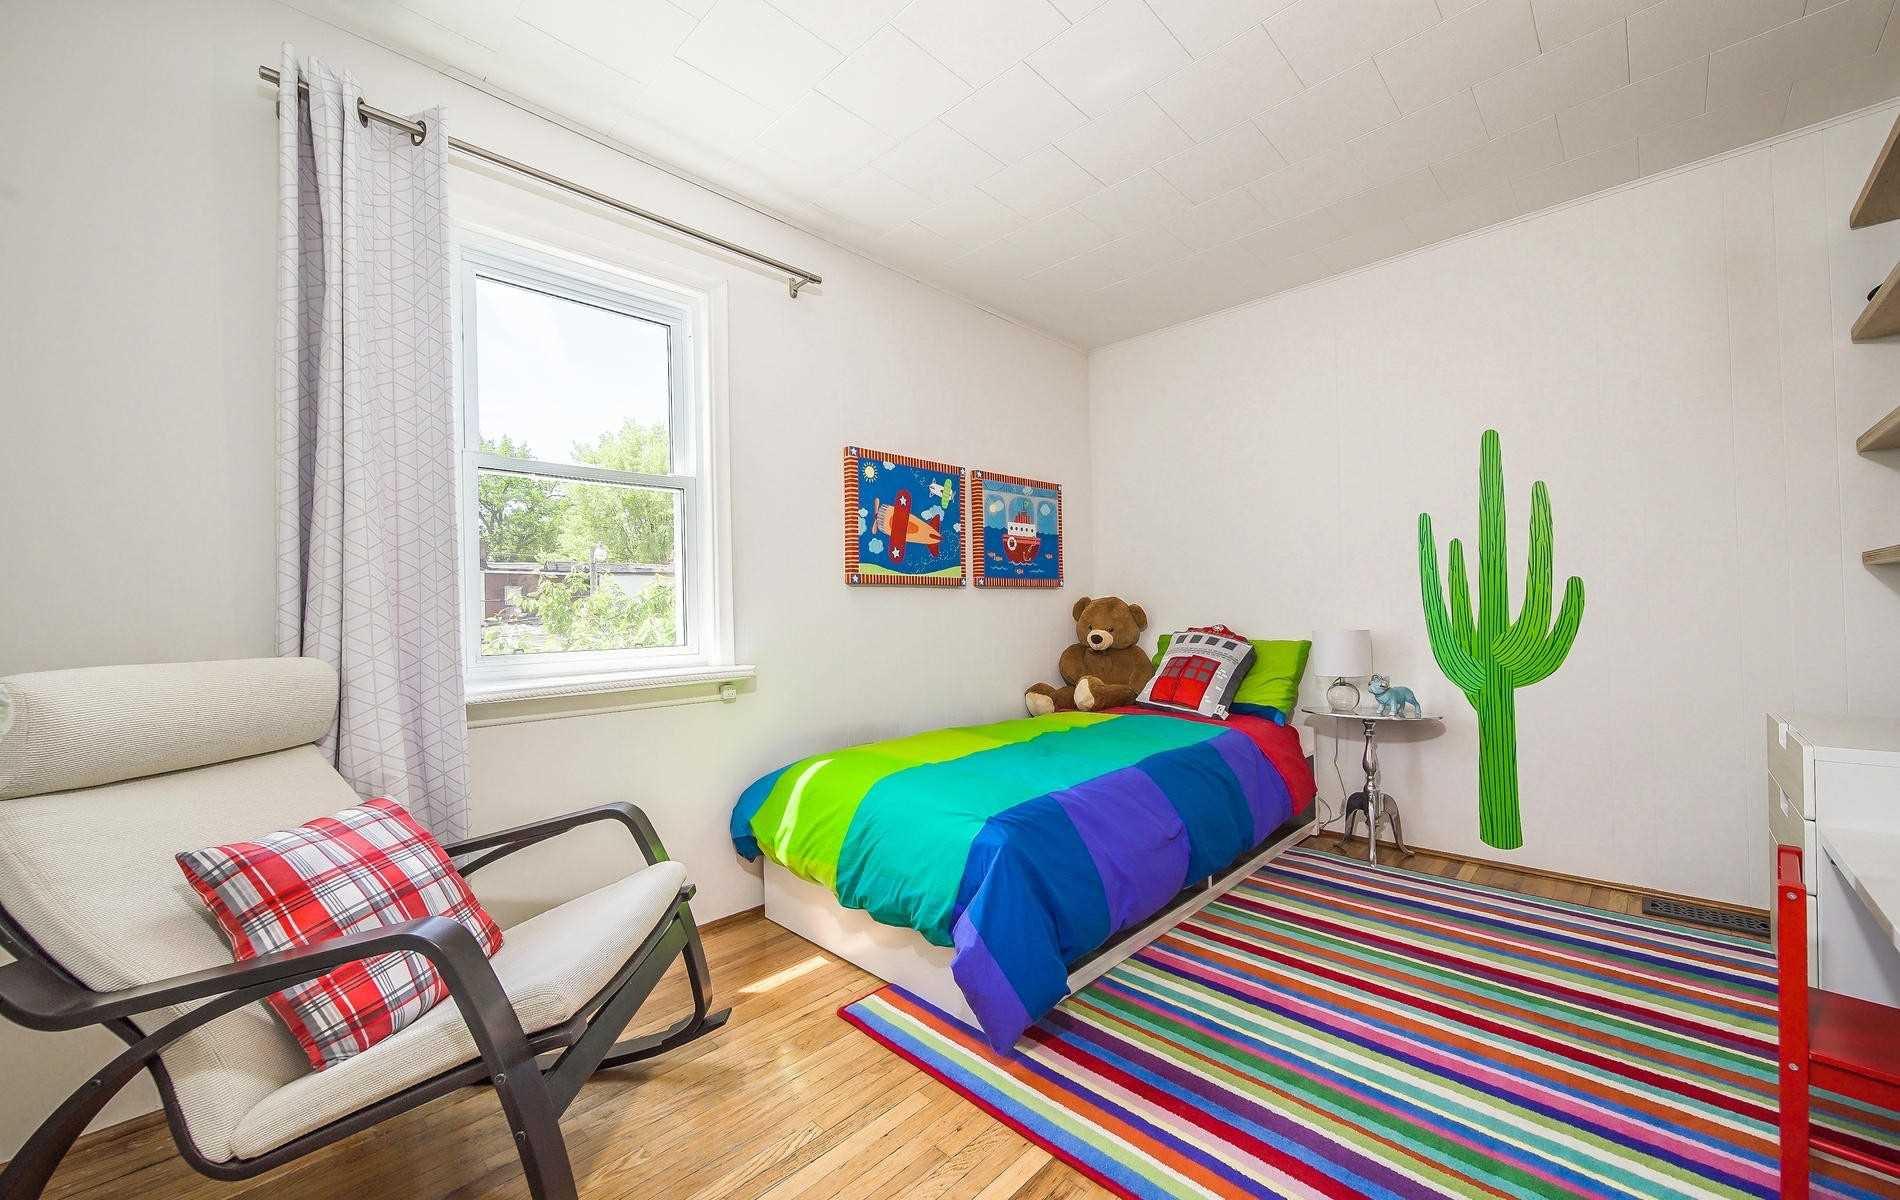 Photo 11: Photos: 64 Larchmount Avenue in Toronto: South Riverdale House (2-Storey) for sale (Toronto E01)  : MLS®# E4489752